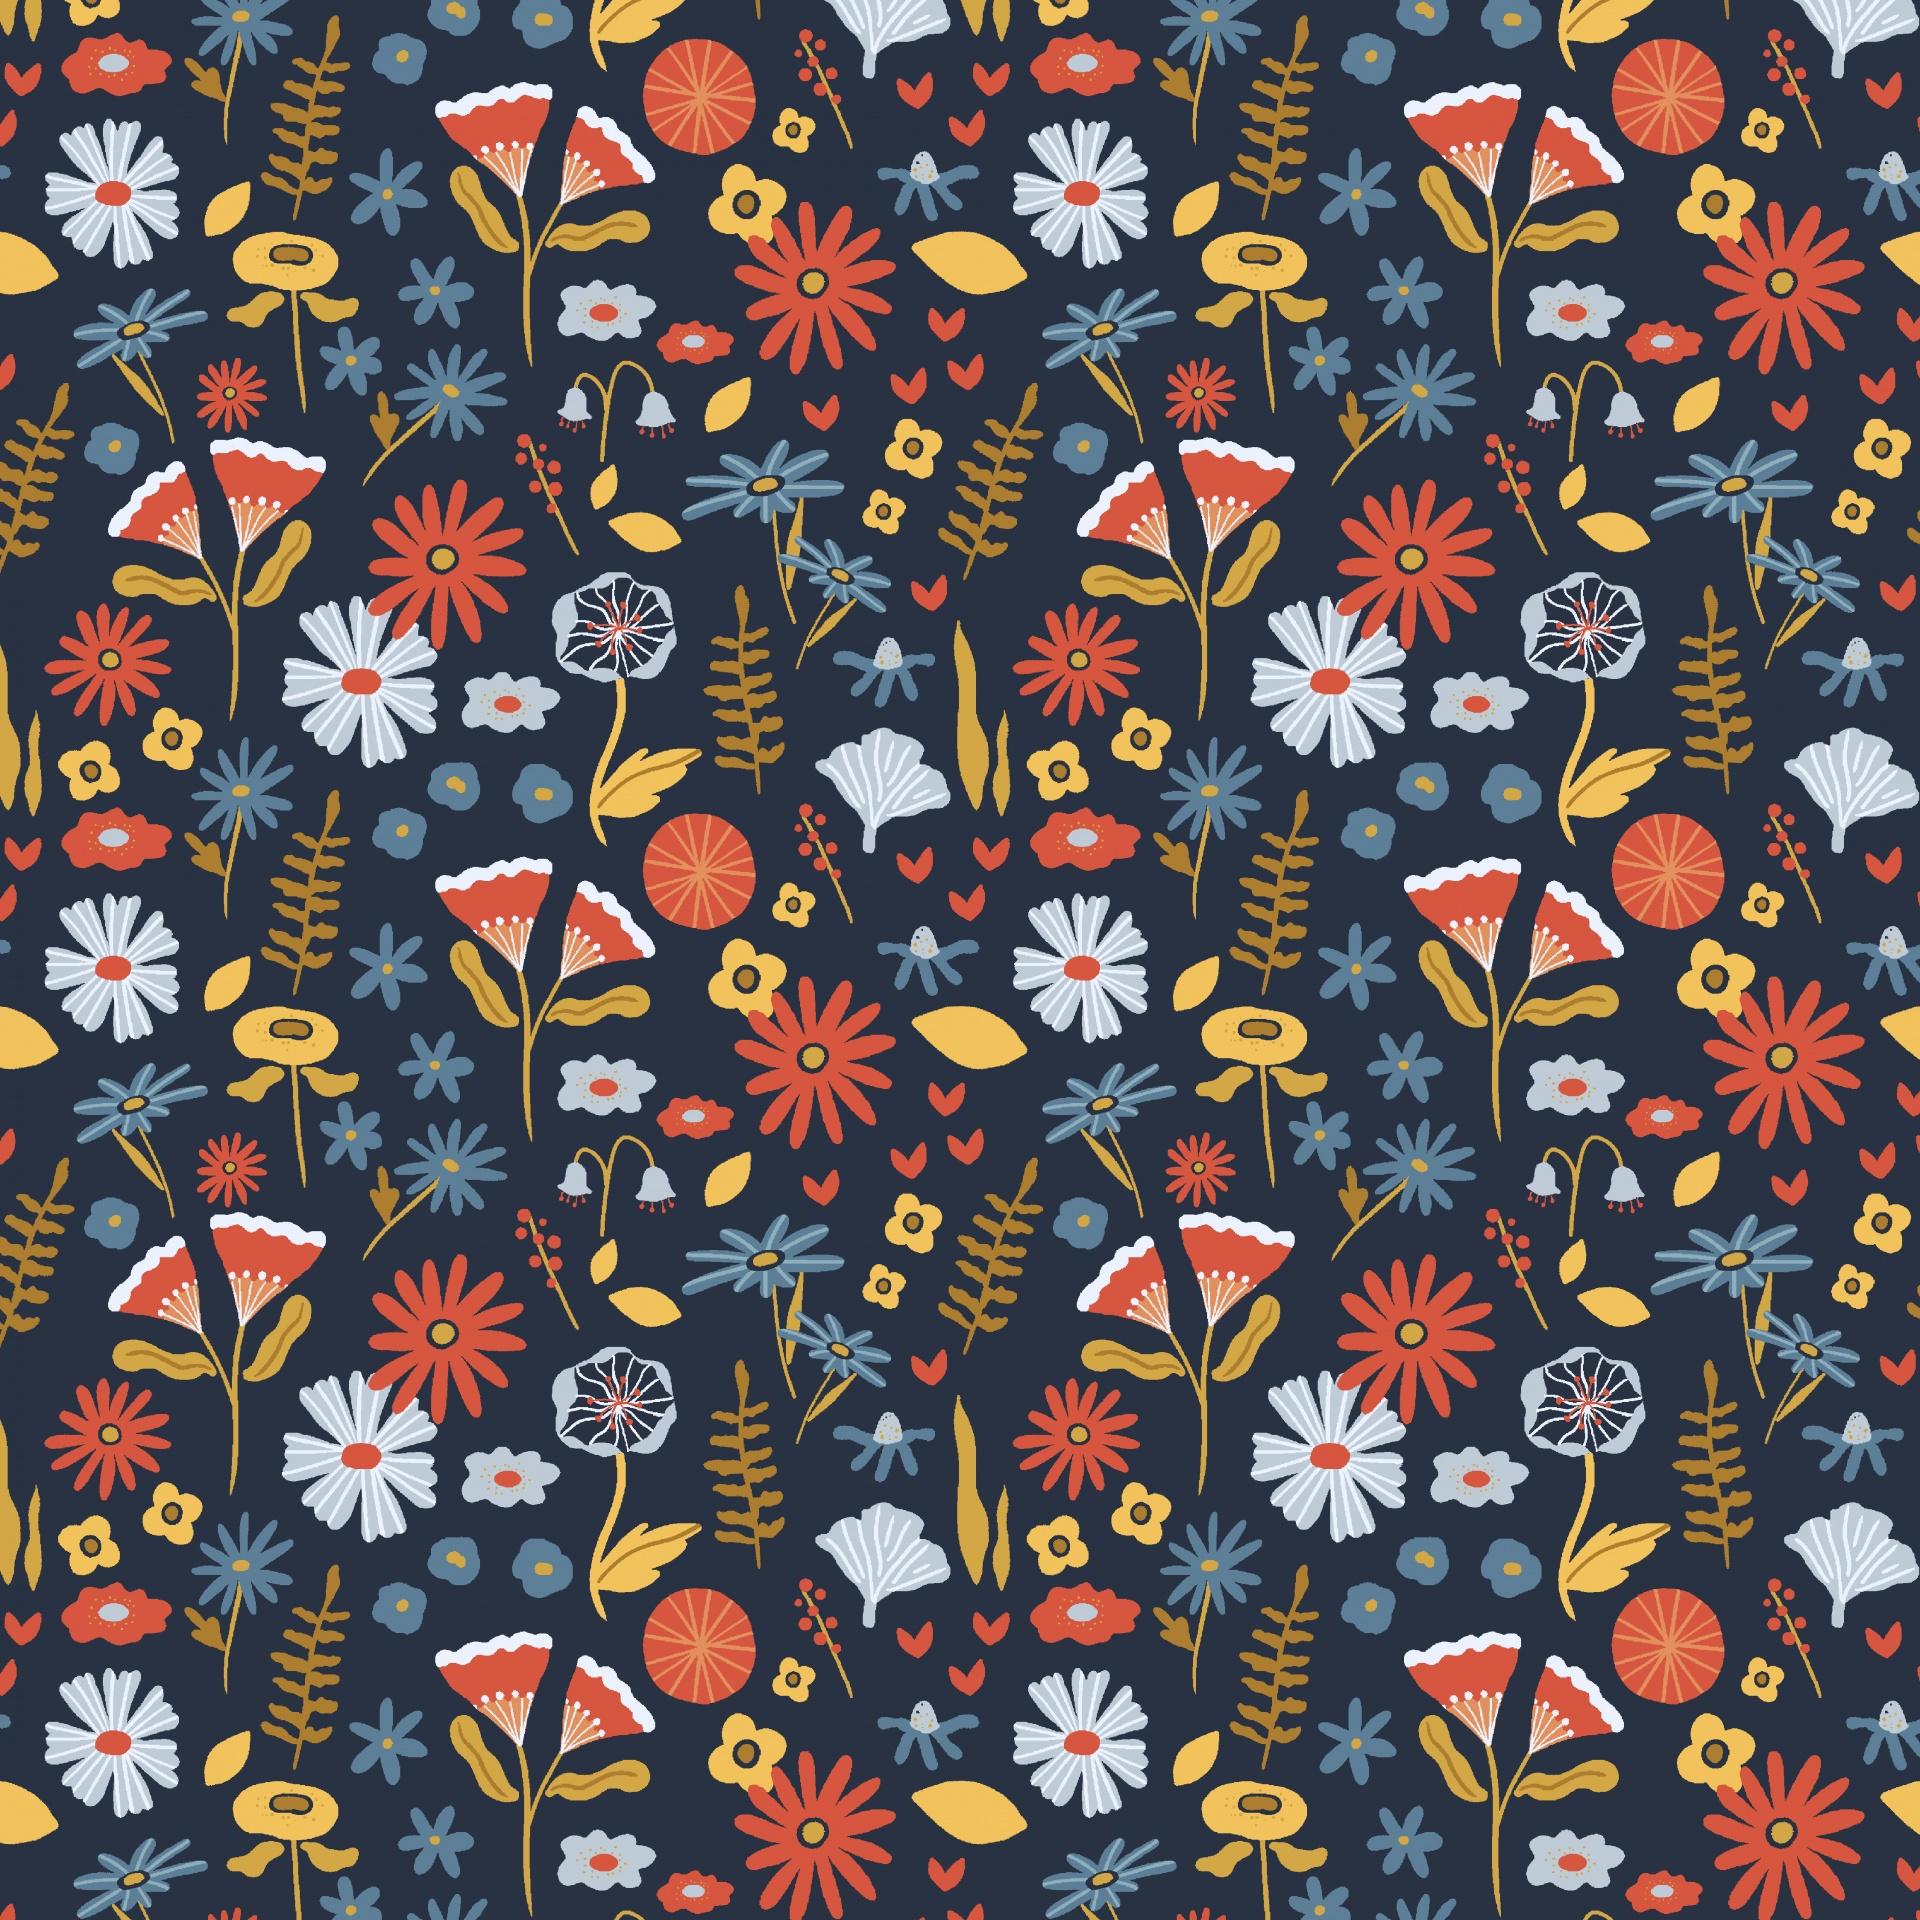 Algodão orgânico - Lovely Flower Field azul marinho